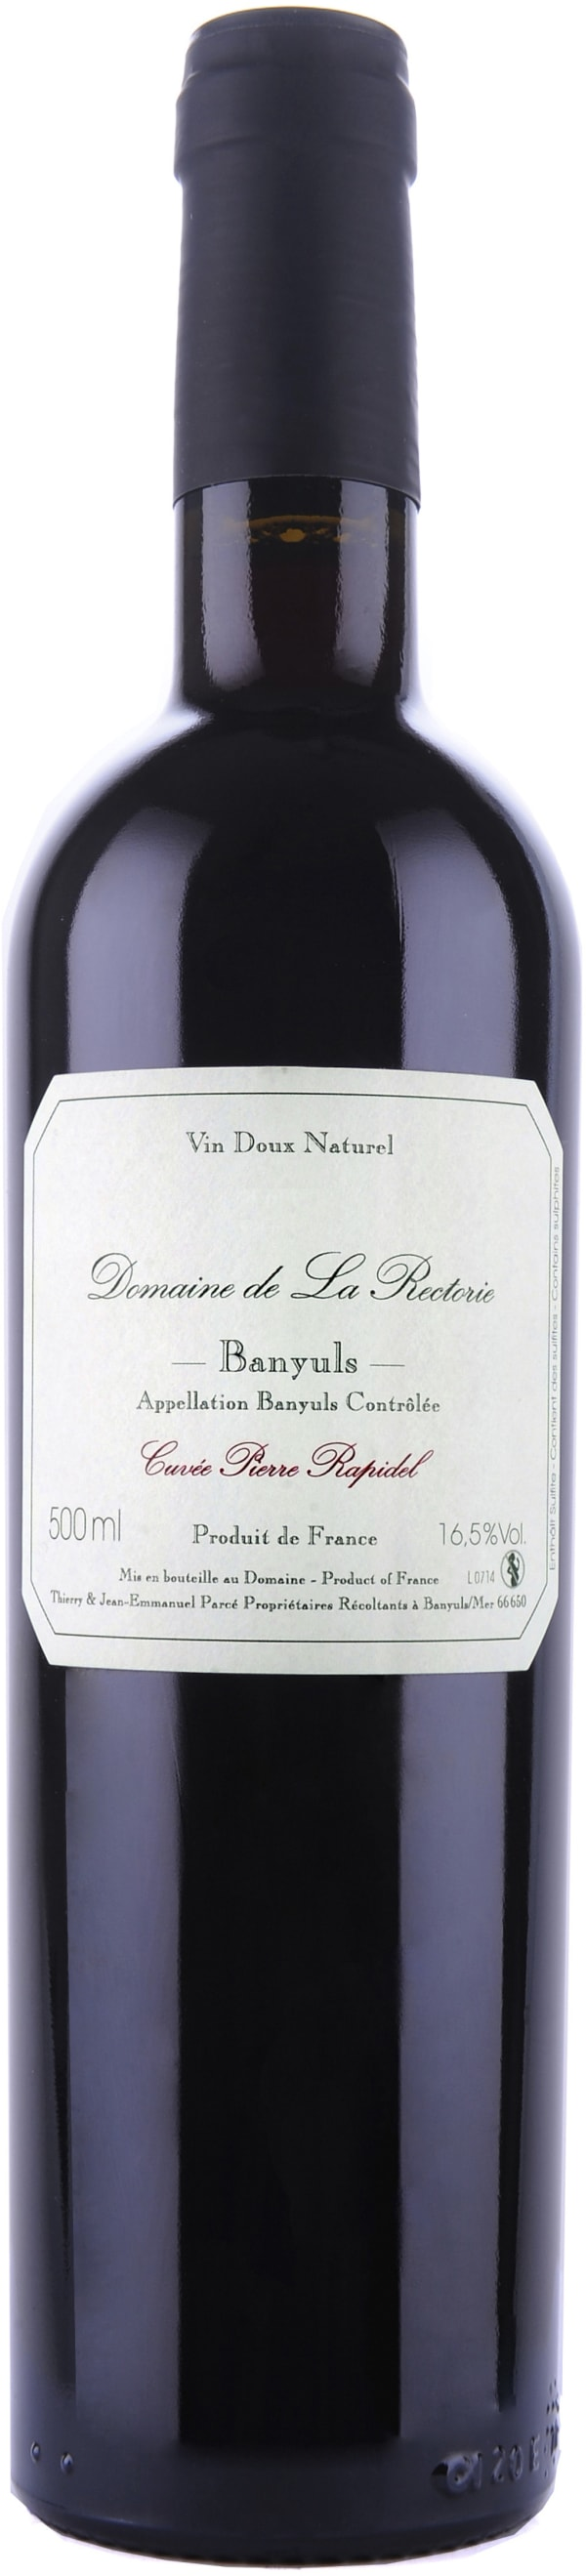 Domaine de la Rectorie Banyuls Traditionnel Pierre Rapidel 2009